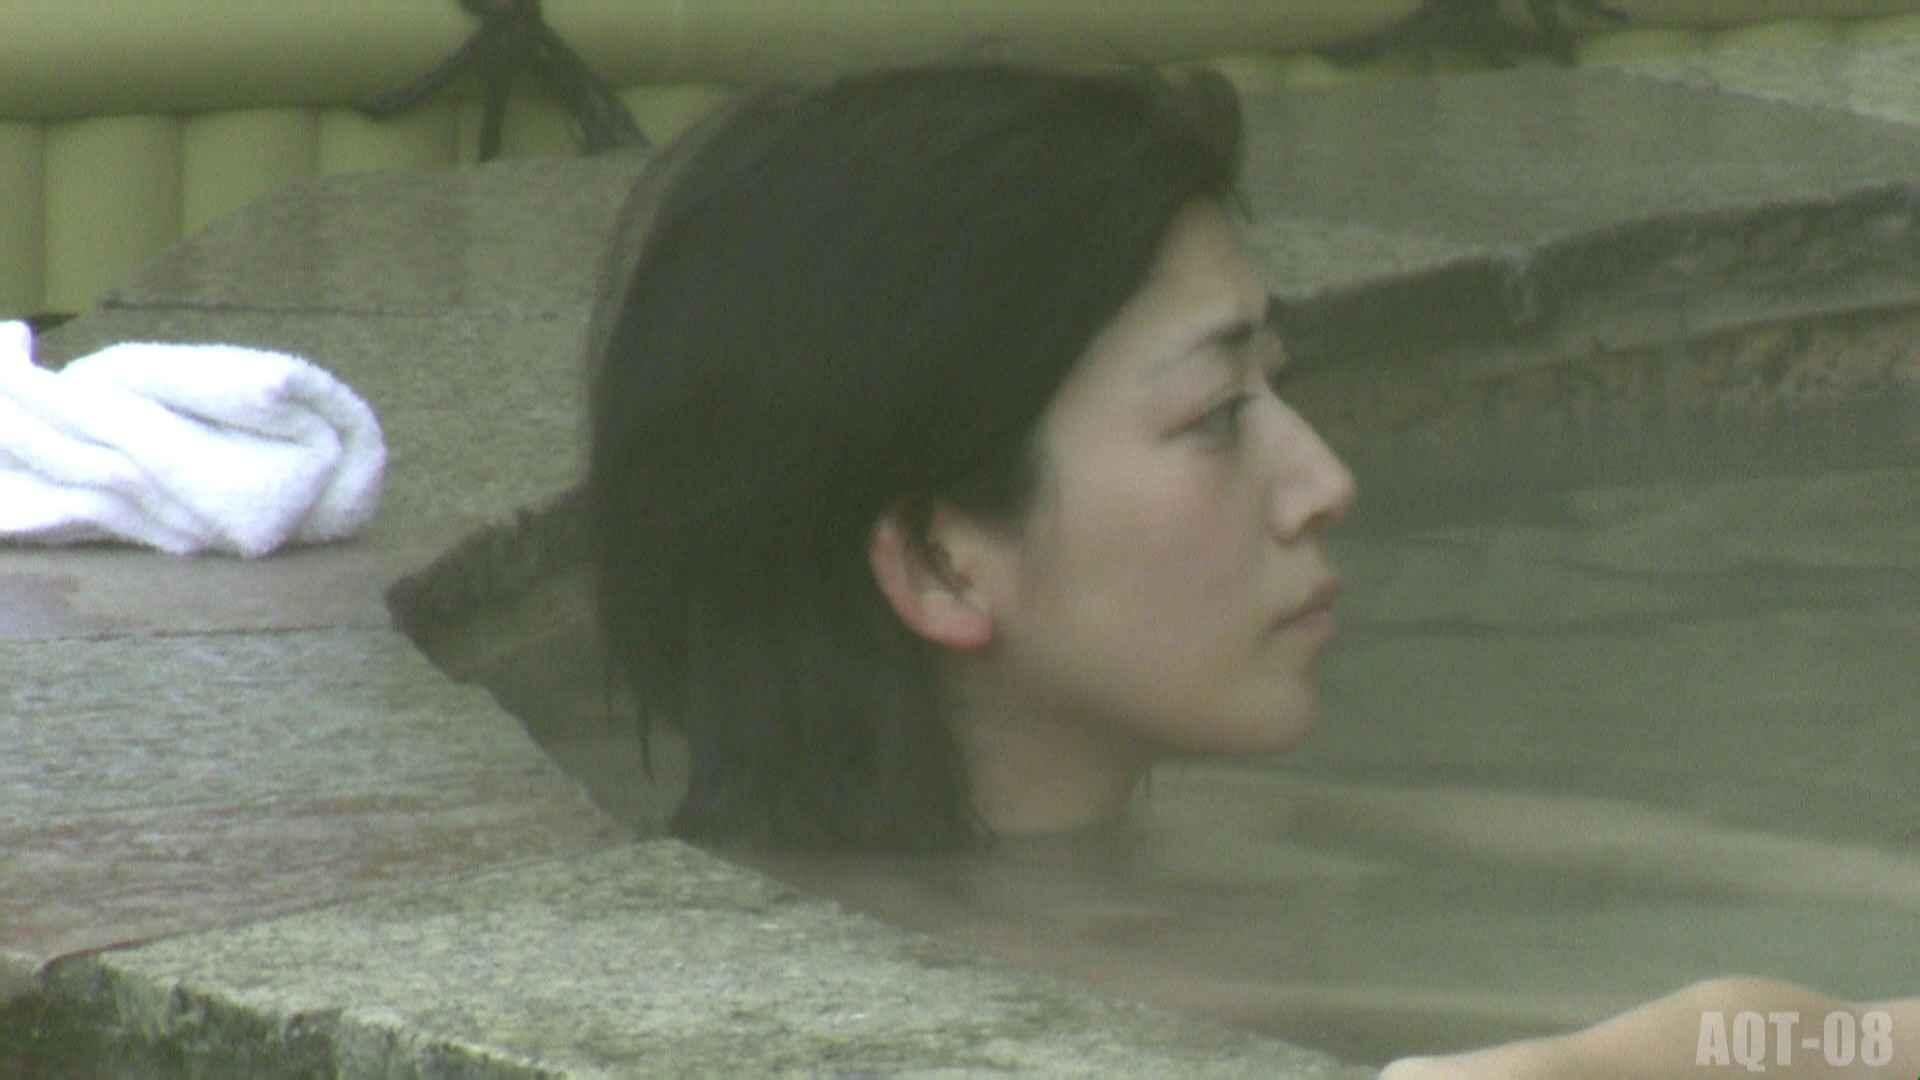 Aquaな露天風呂Vol.776 露天 | OLセックス  108画像 31